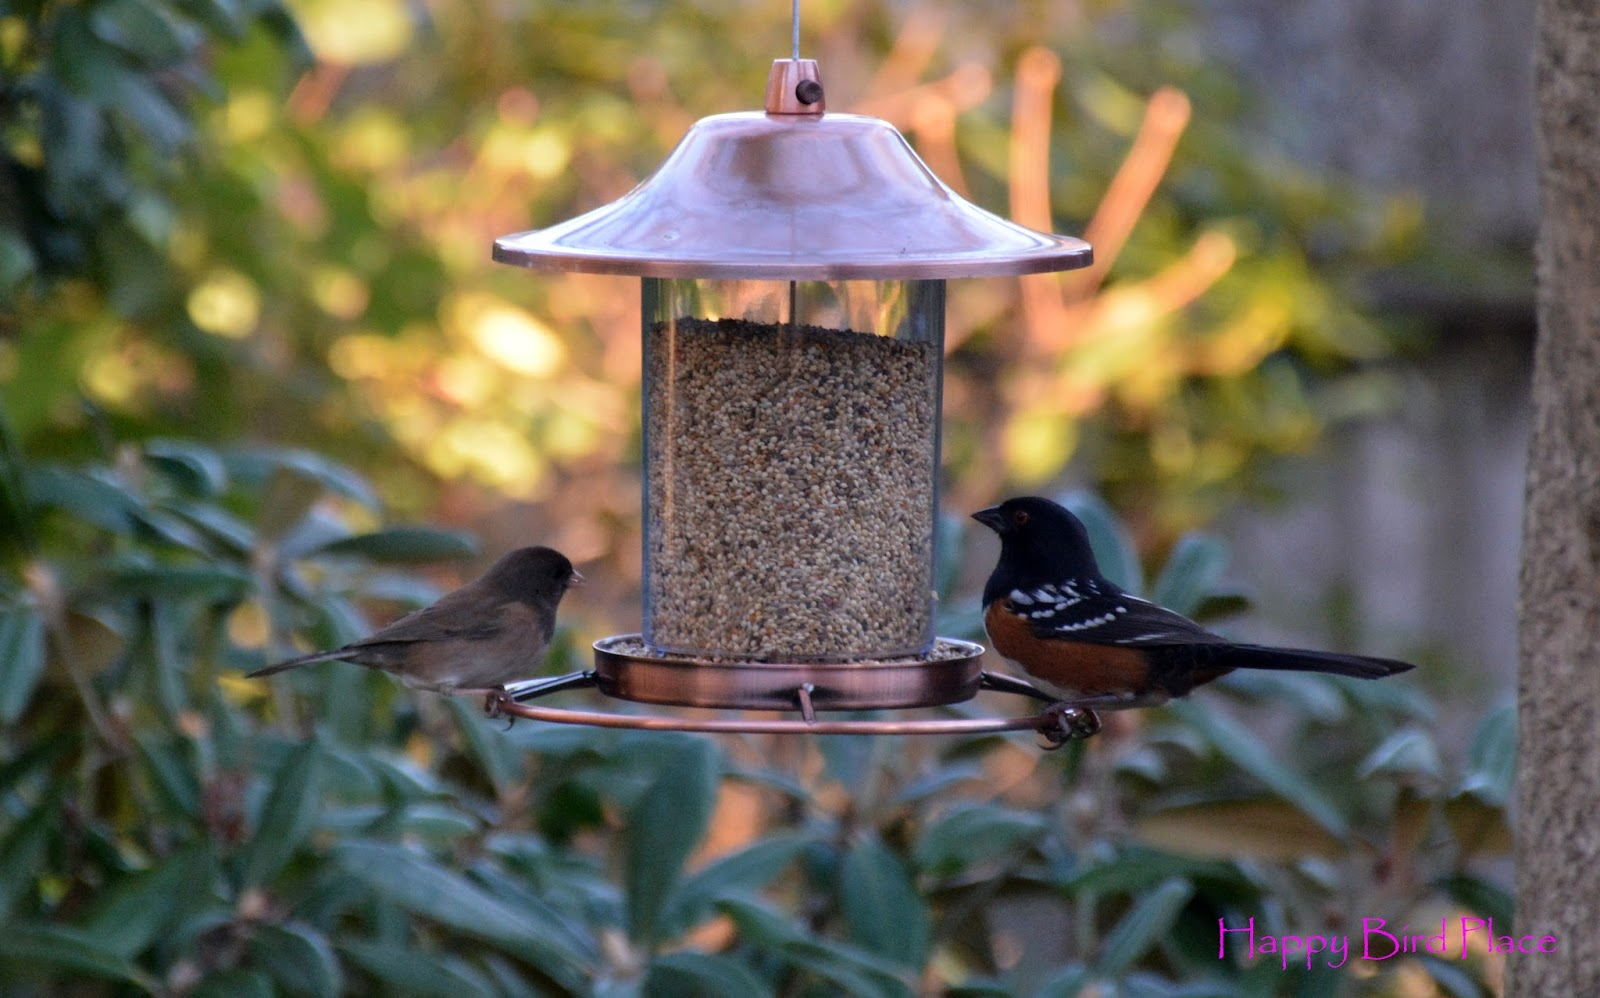 happy bird place finch and grasskeet blog backyard birds at my